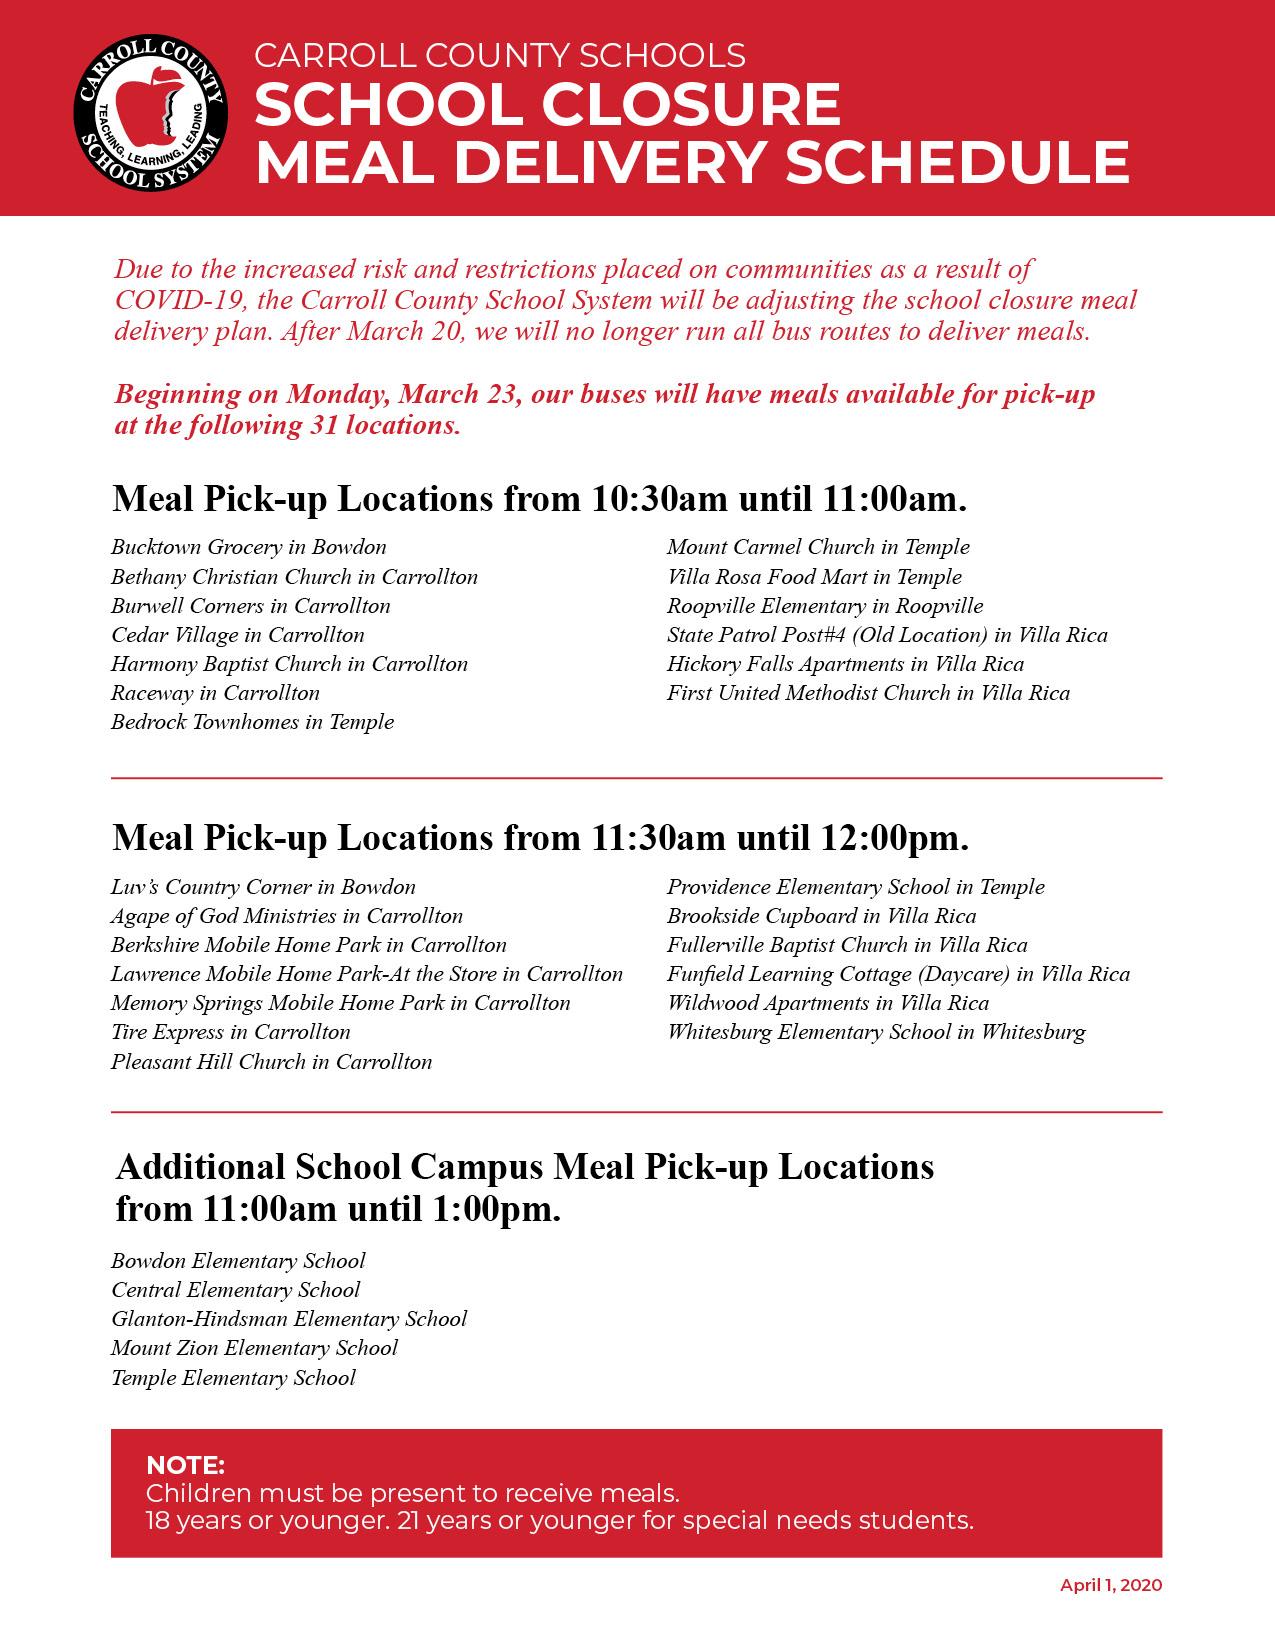 School Closure Meal Delivery Schedule